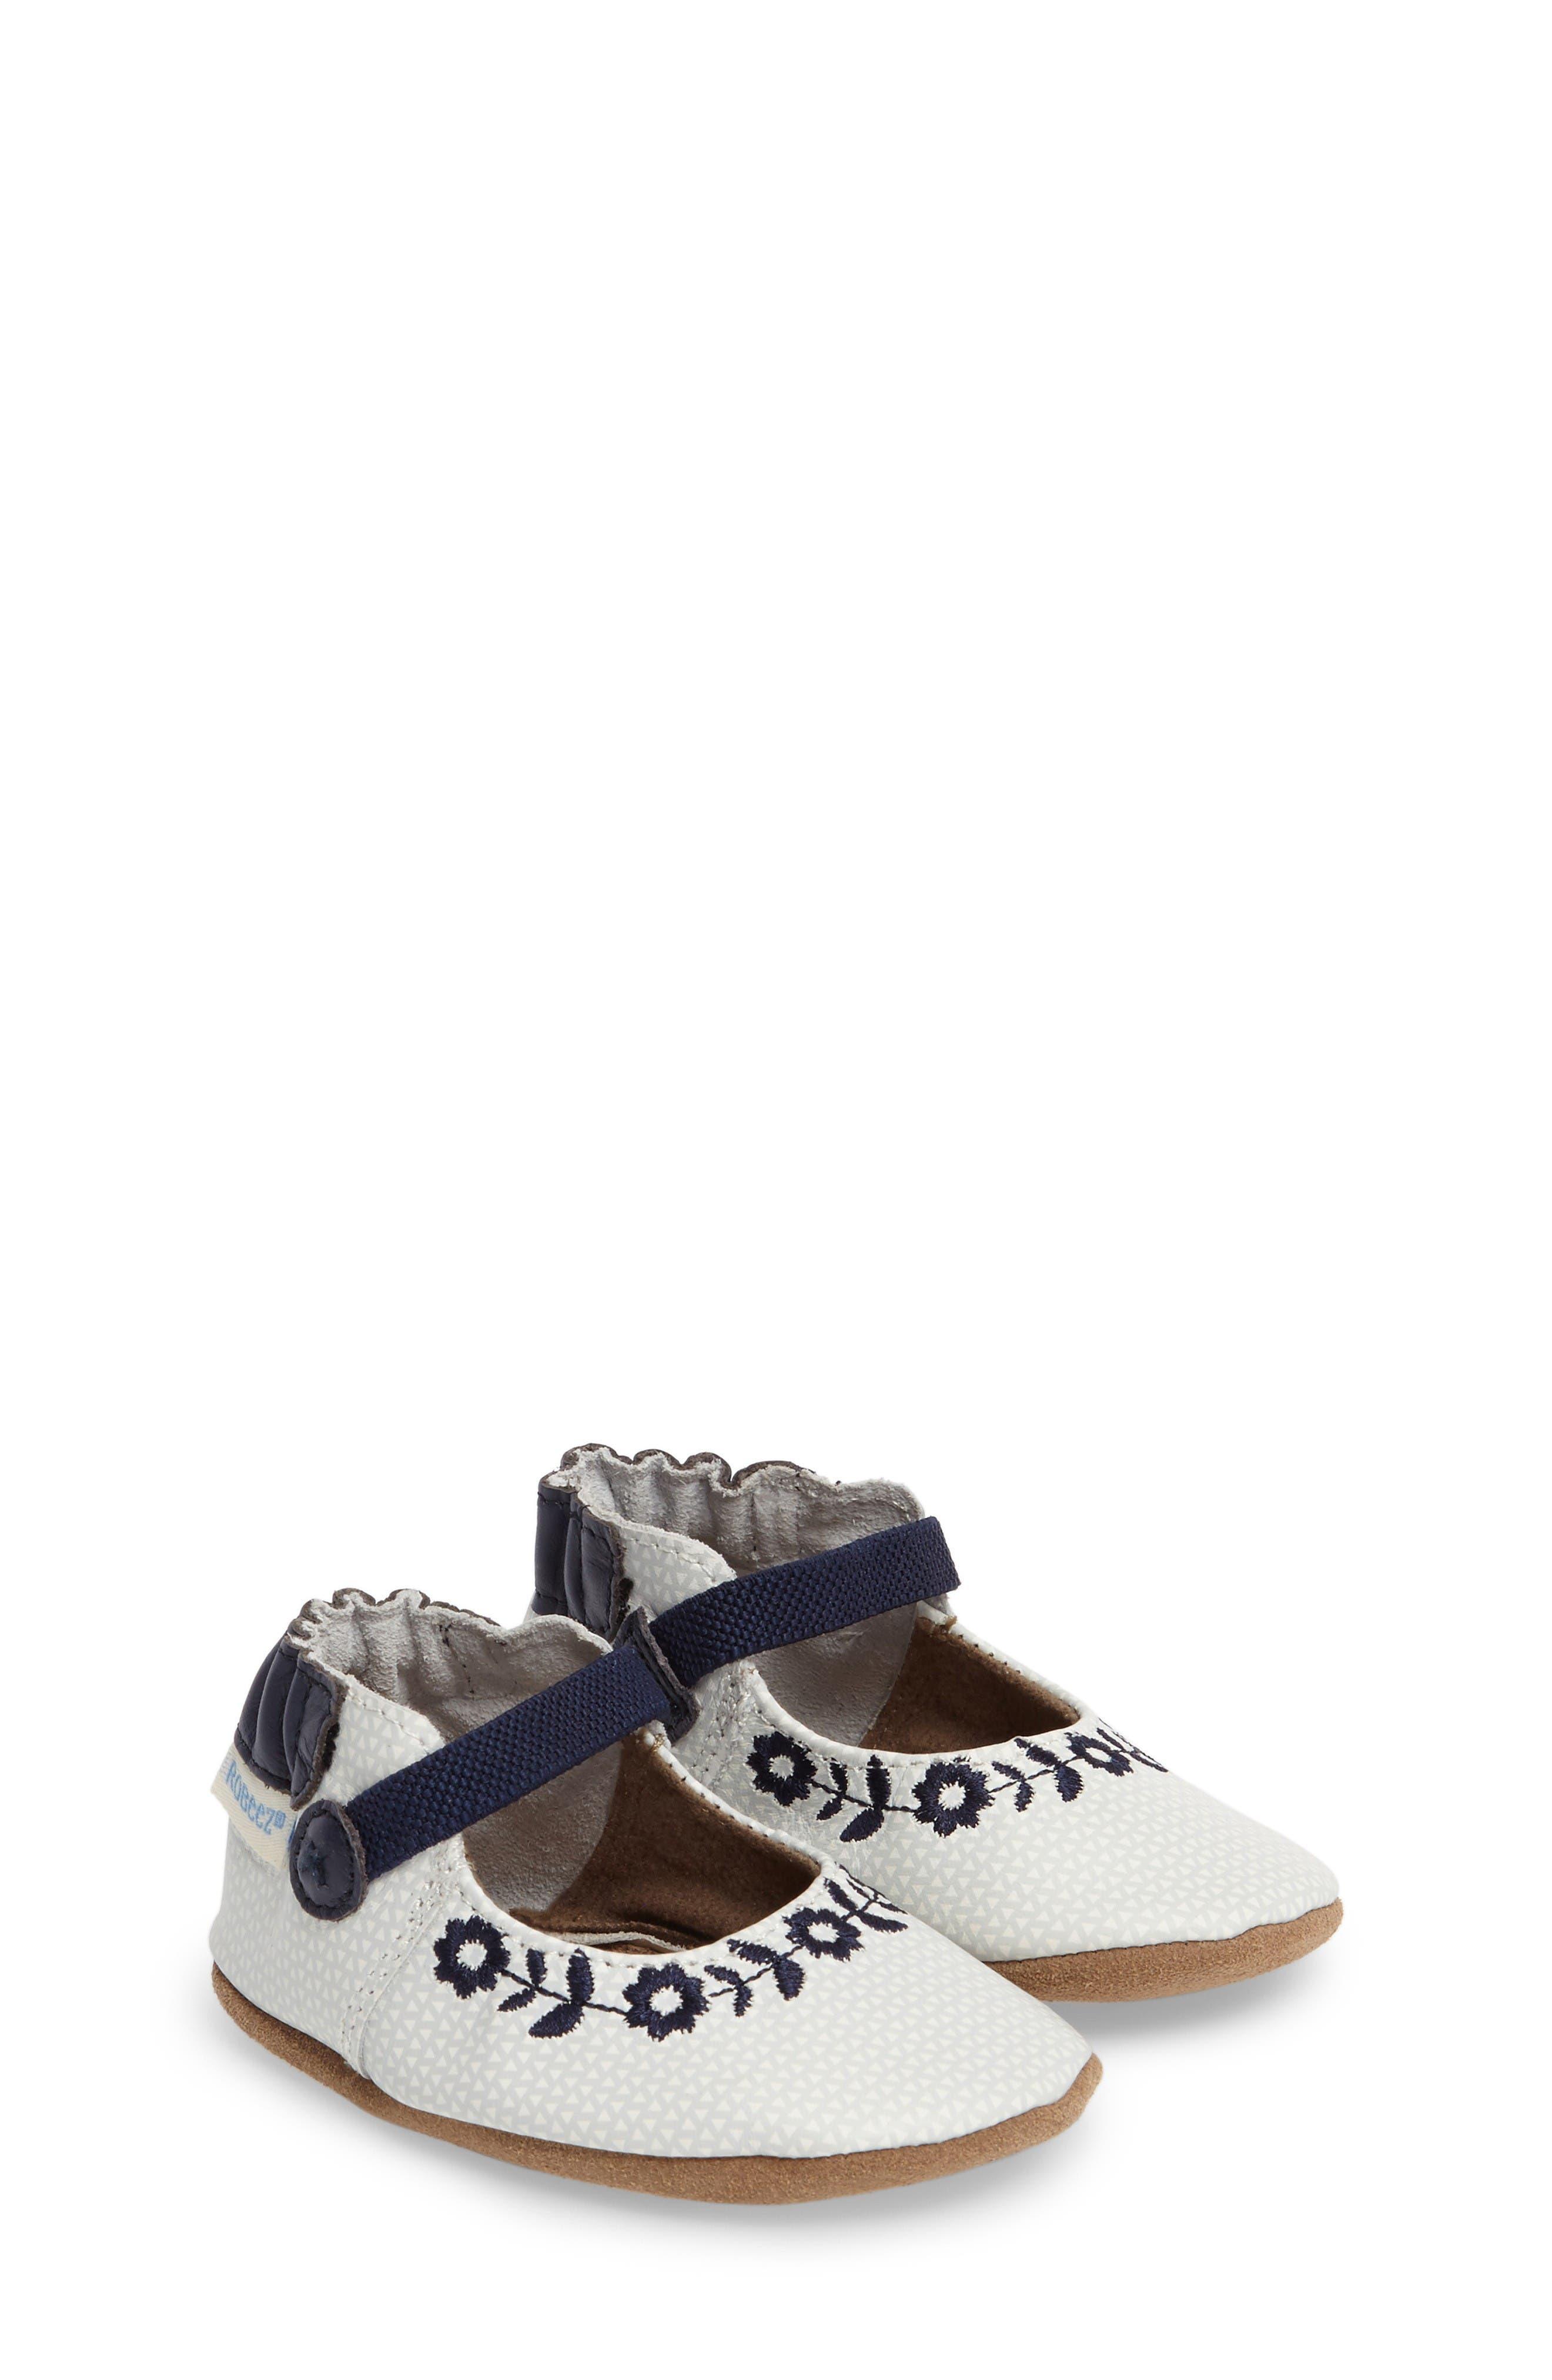 Main Image - Robeez® Daisy Lane Embroidered Mary Jane Crib Shoe (Baby & Walker)